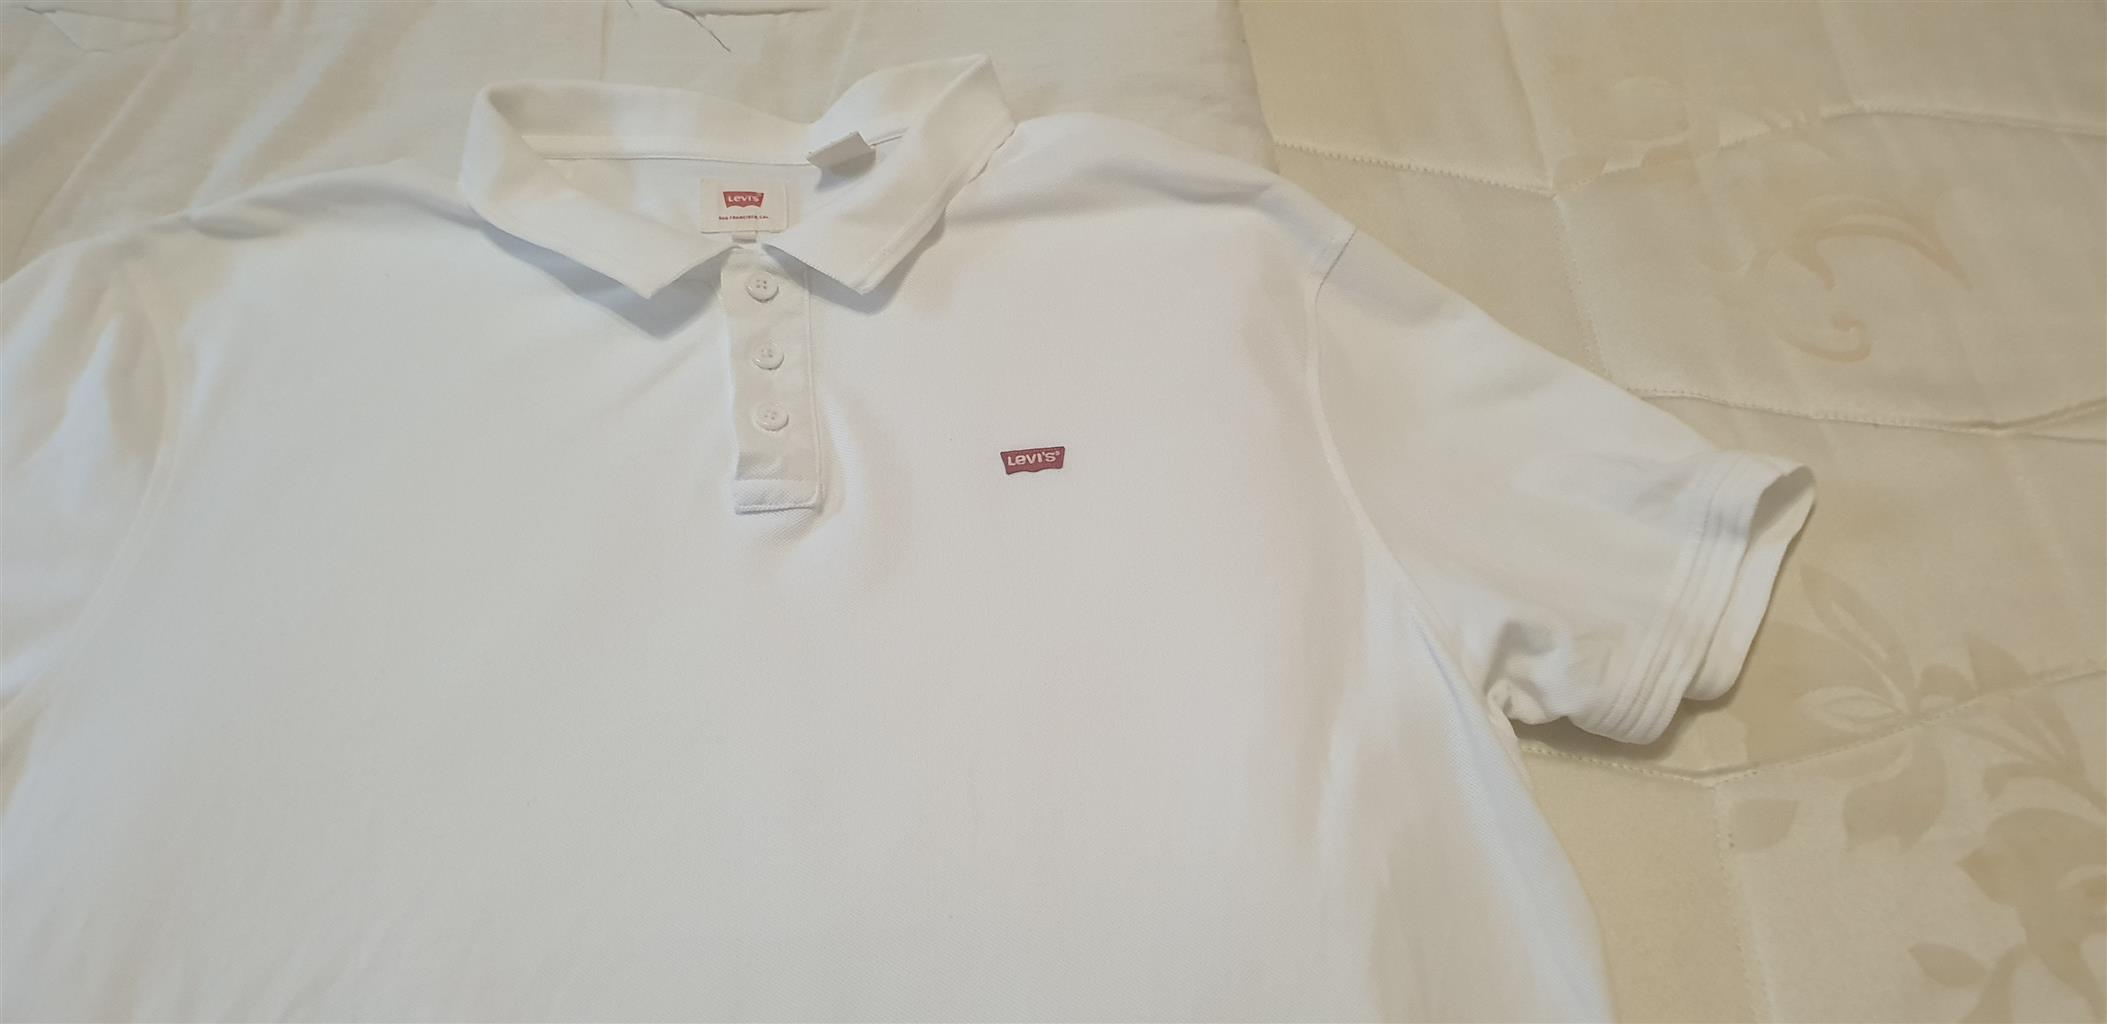 Levi Golf shirt